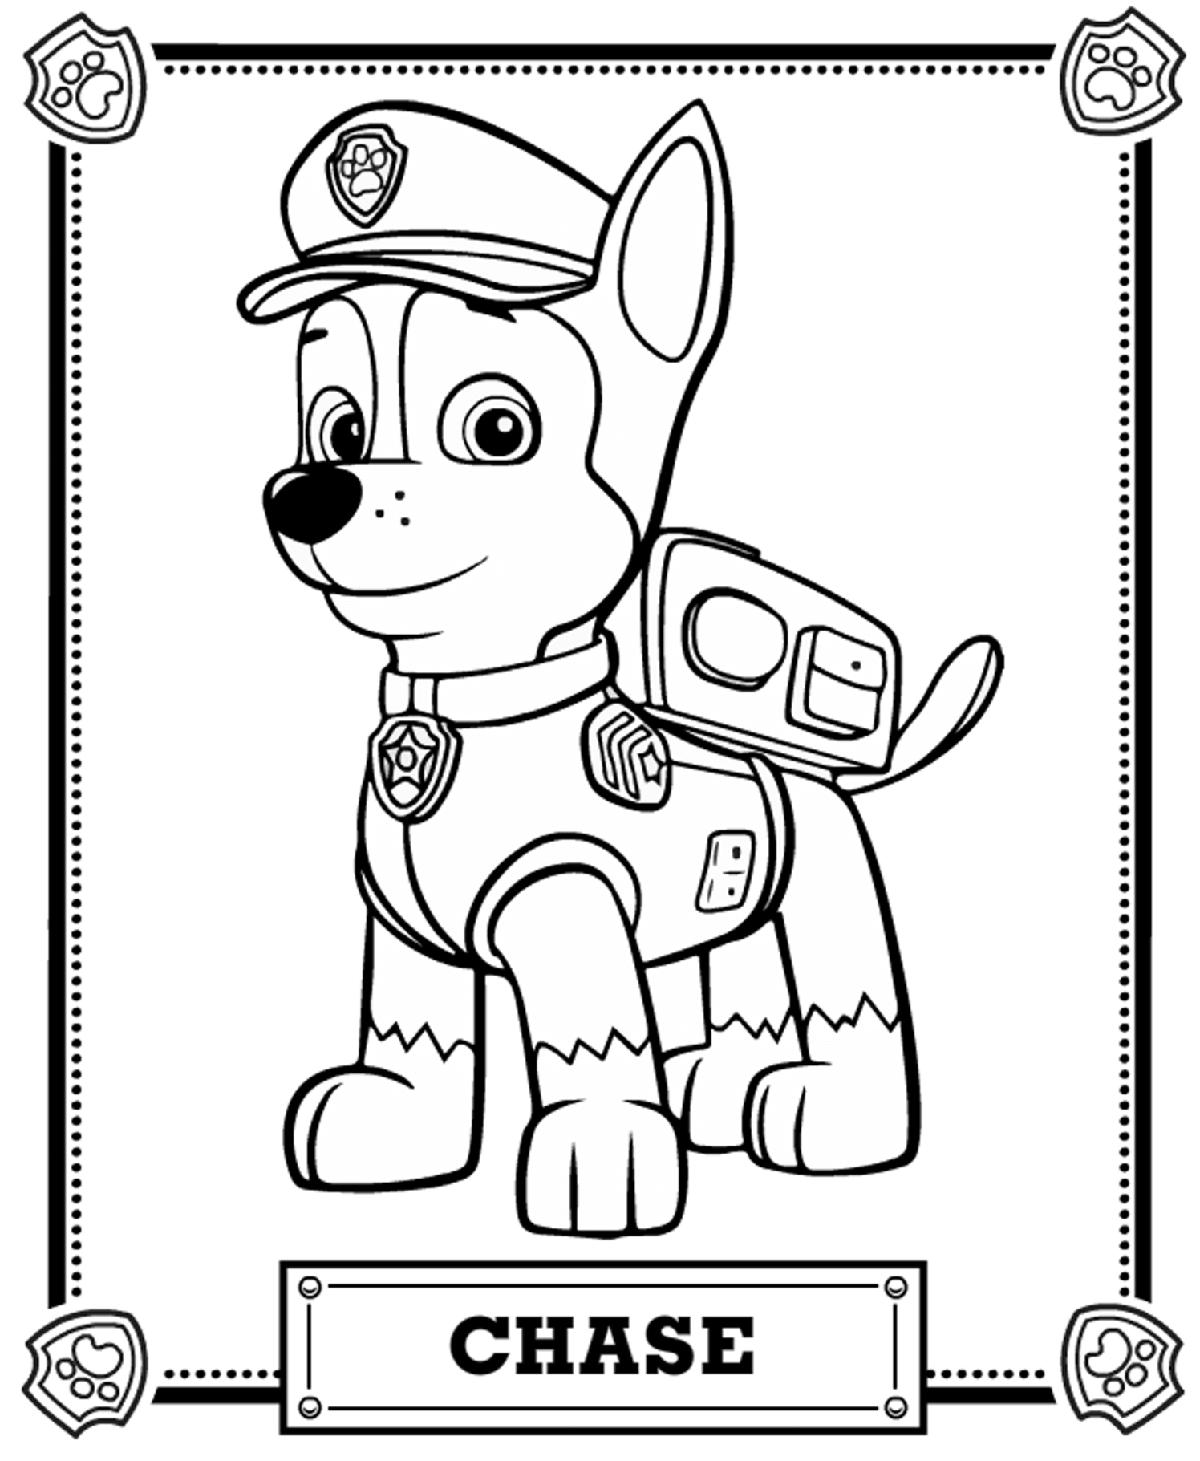 paw patrol coloring pages paw patrol free colouring pages patrol coloring paw pages